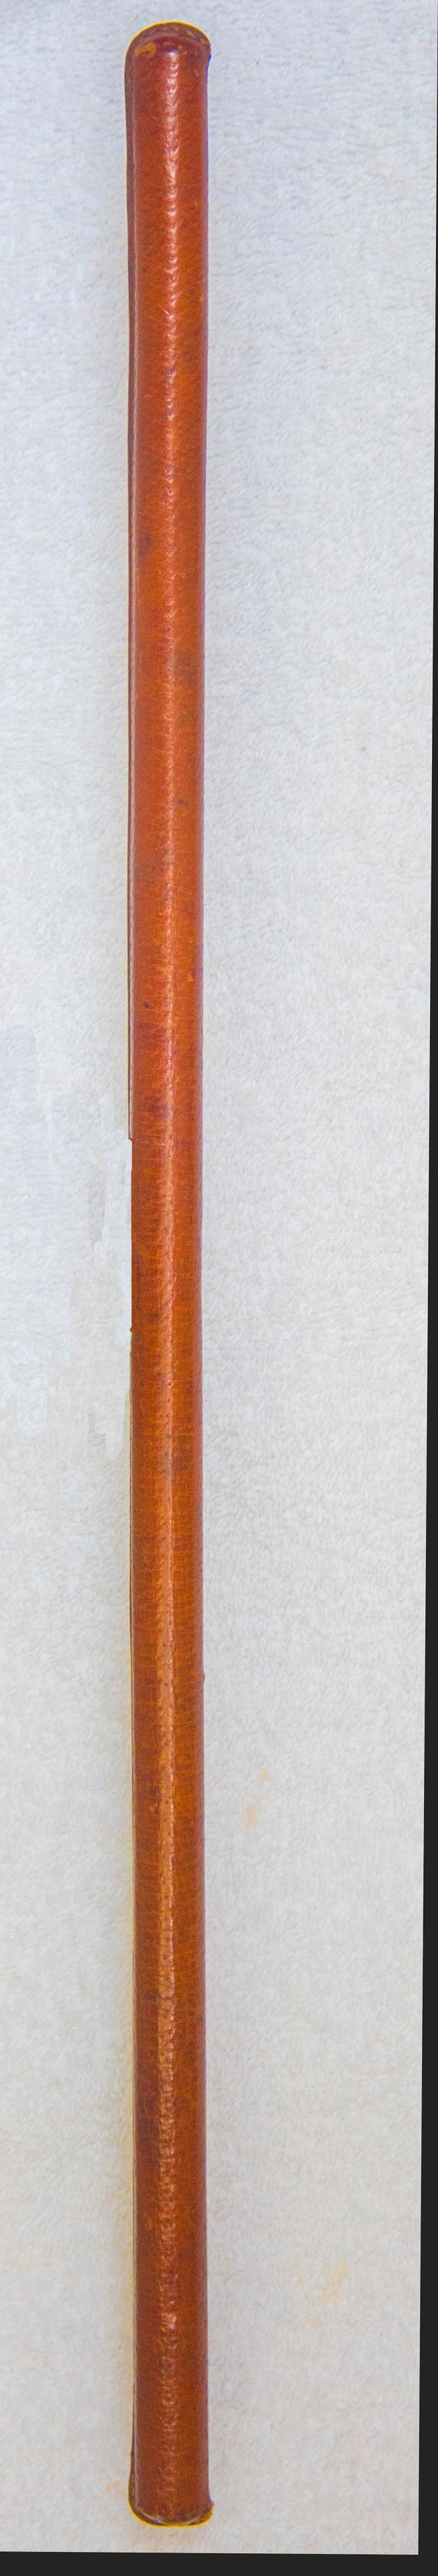 SWAGGER STICK copy 5